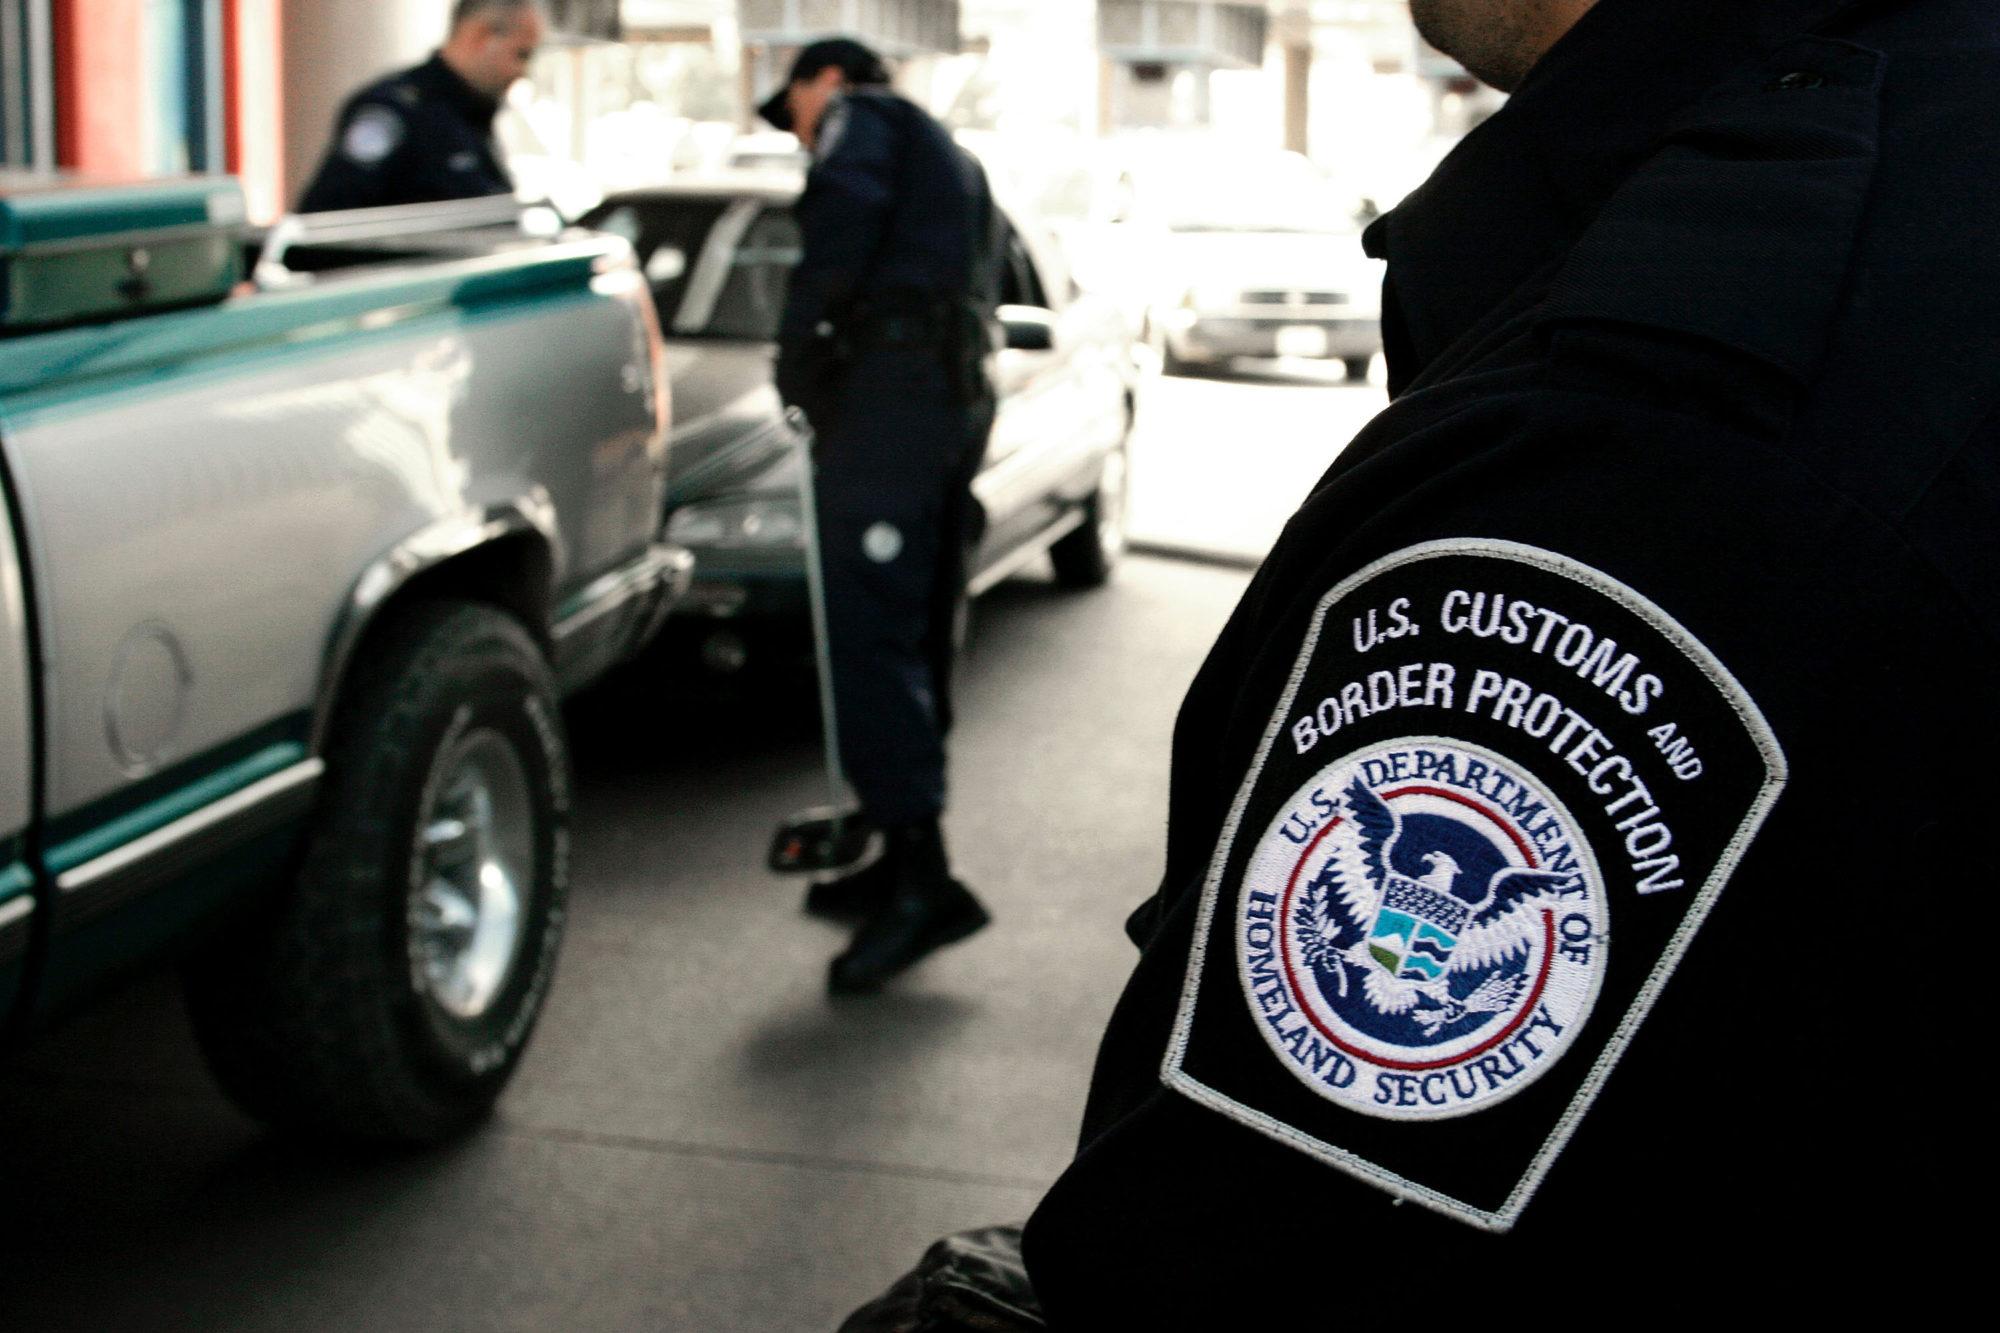 Border Patrol Condemns Secret Facebook Group, but Reveals Few Specifics